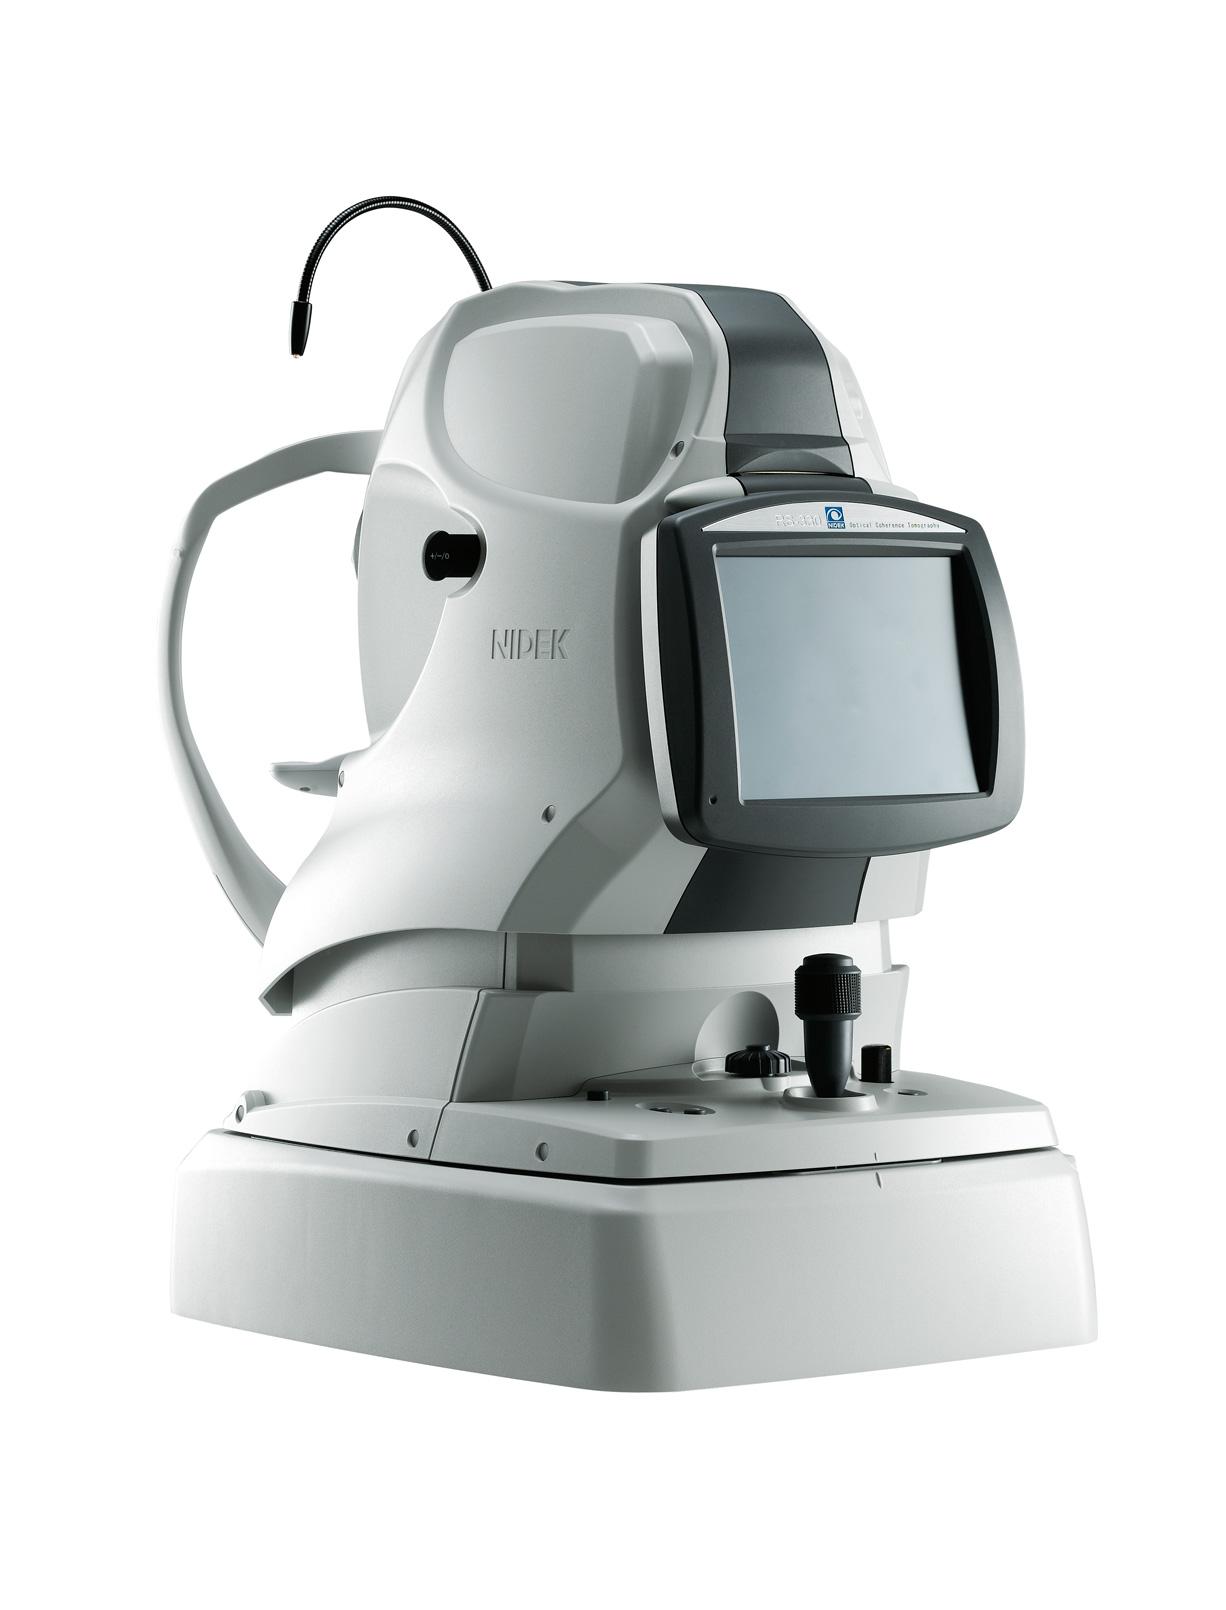 Nidek RS-330